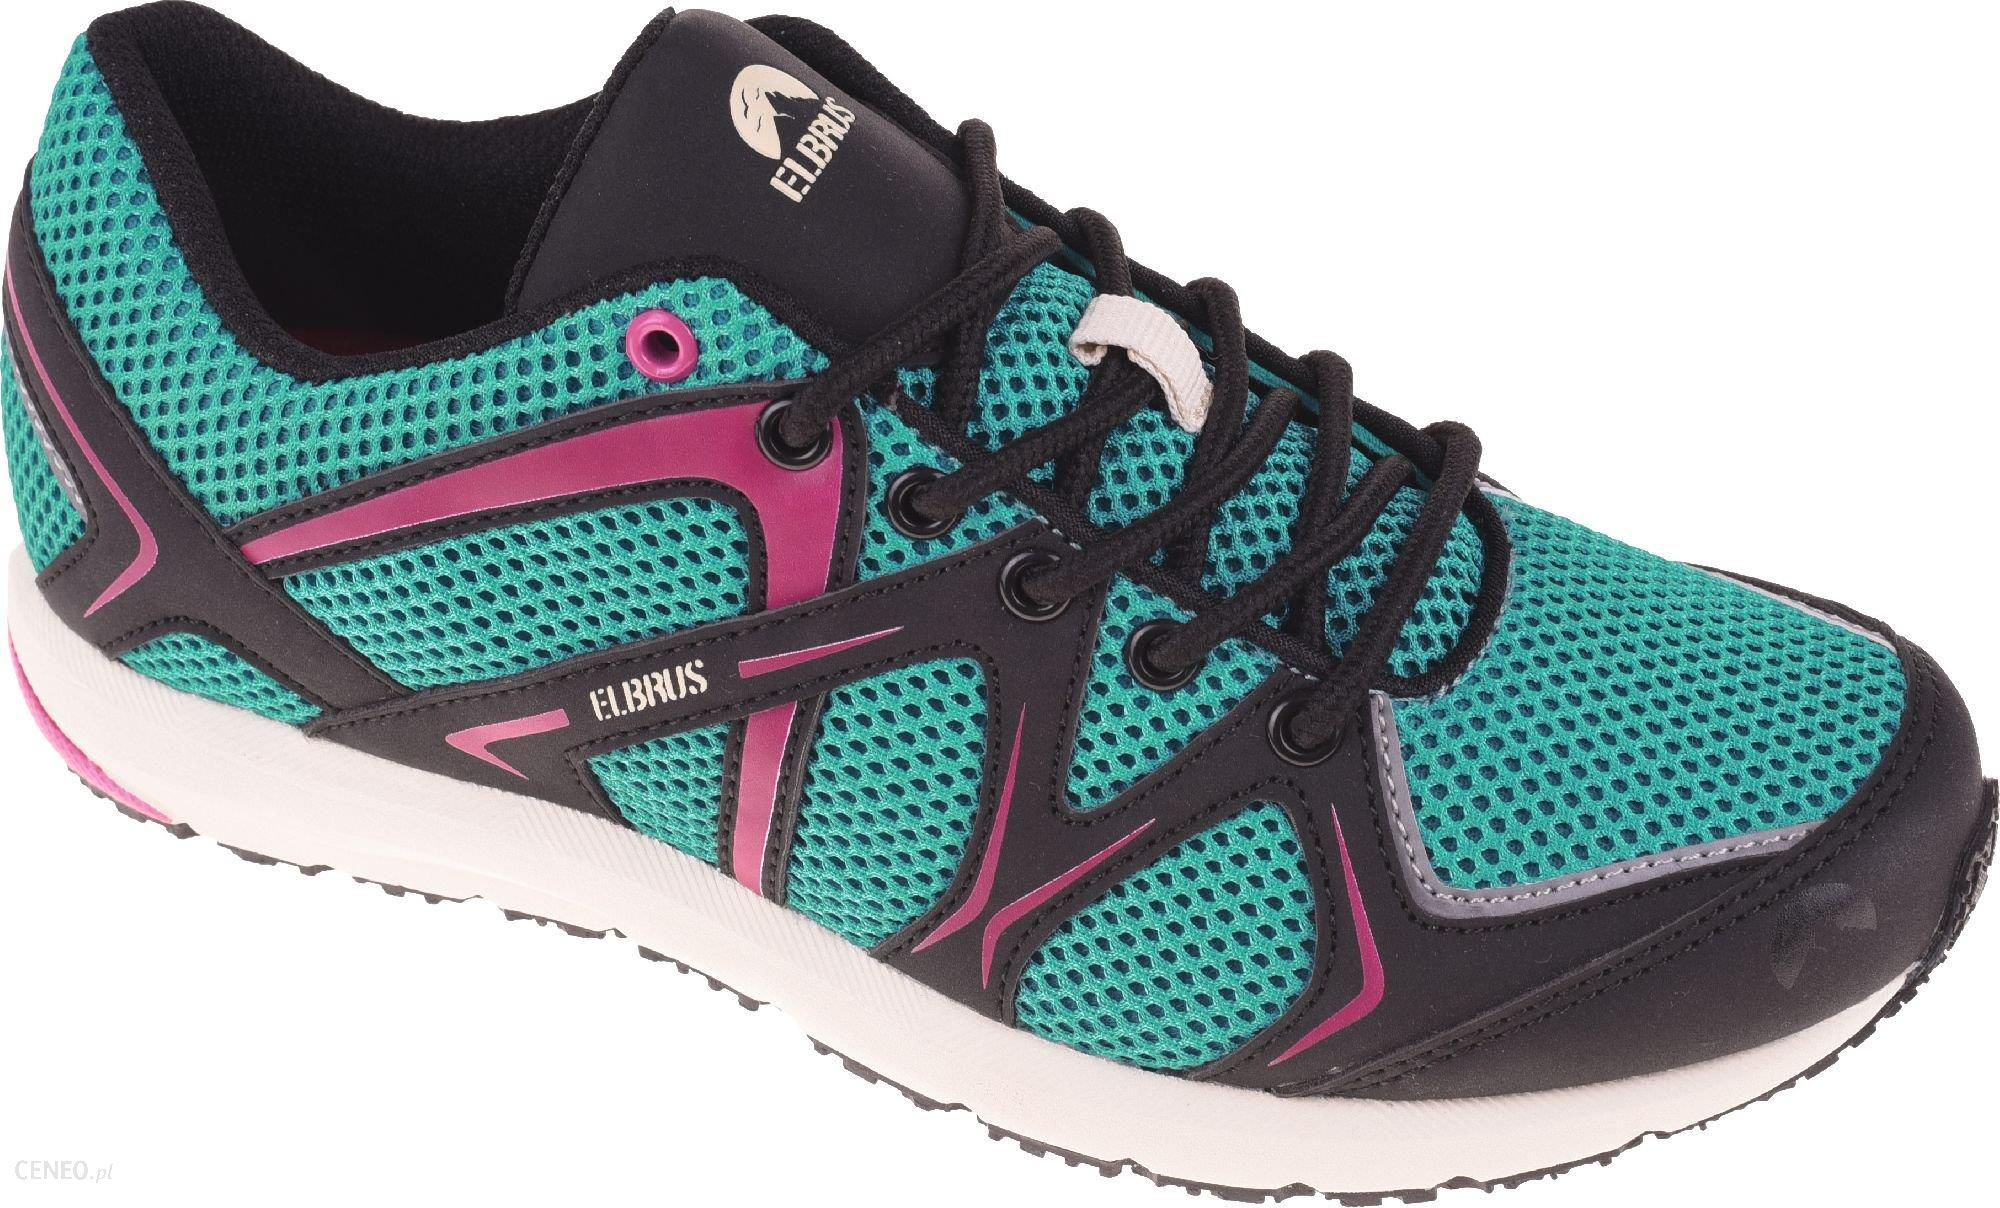 Damskie buty trekkingowe ALECO WO'S 4749 CORALDK VIOL ELBRUS